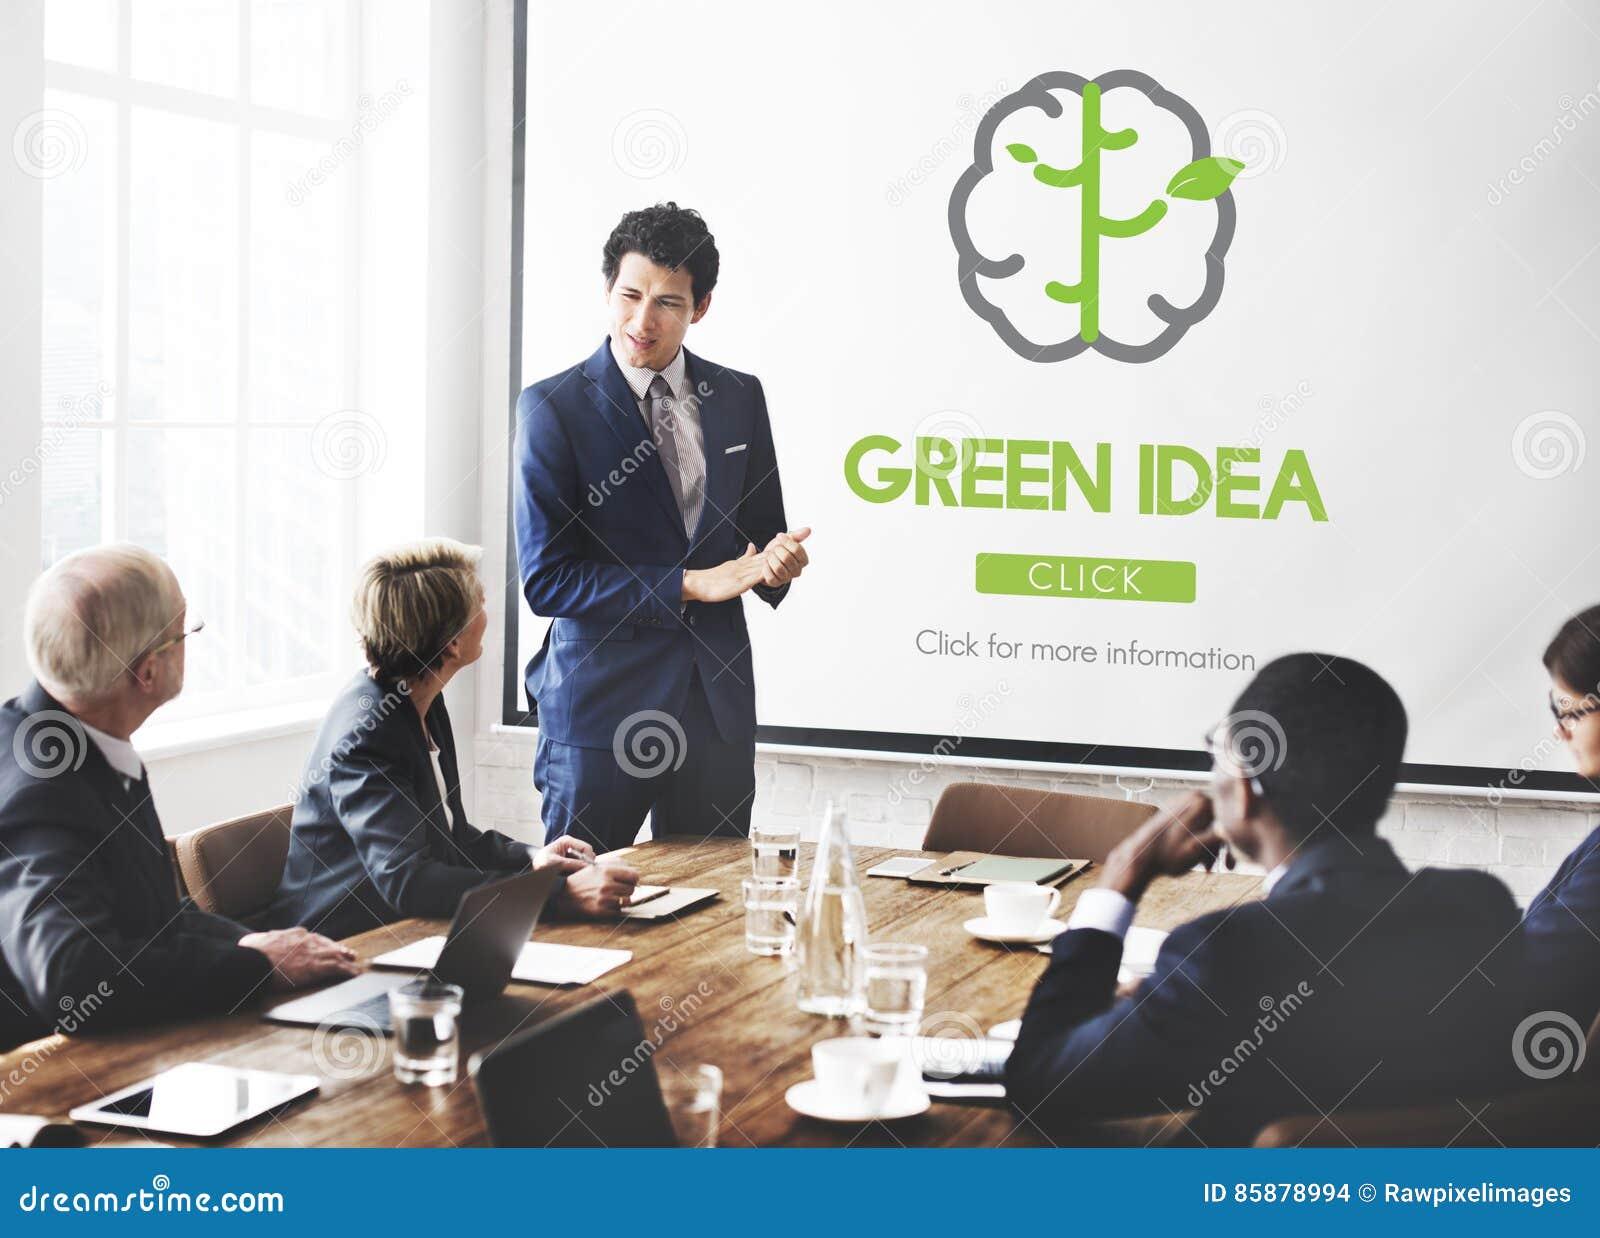 Green Idea Conservation Conservation Nature Concept